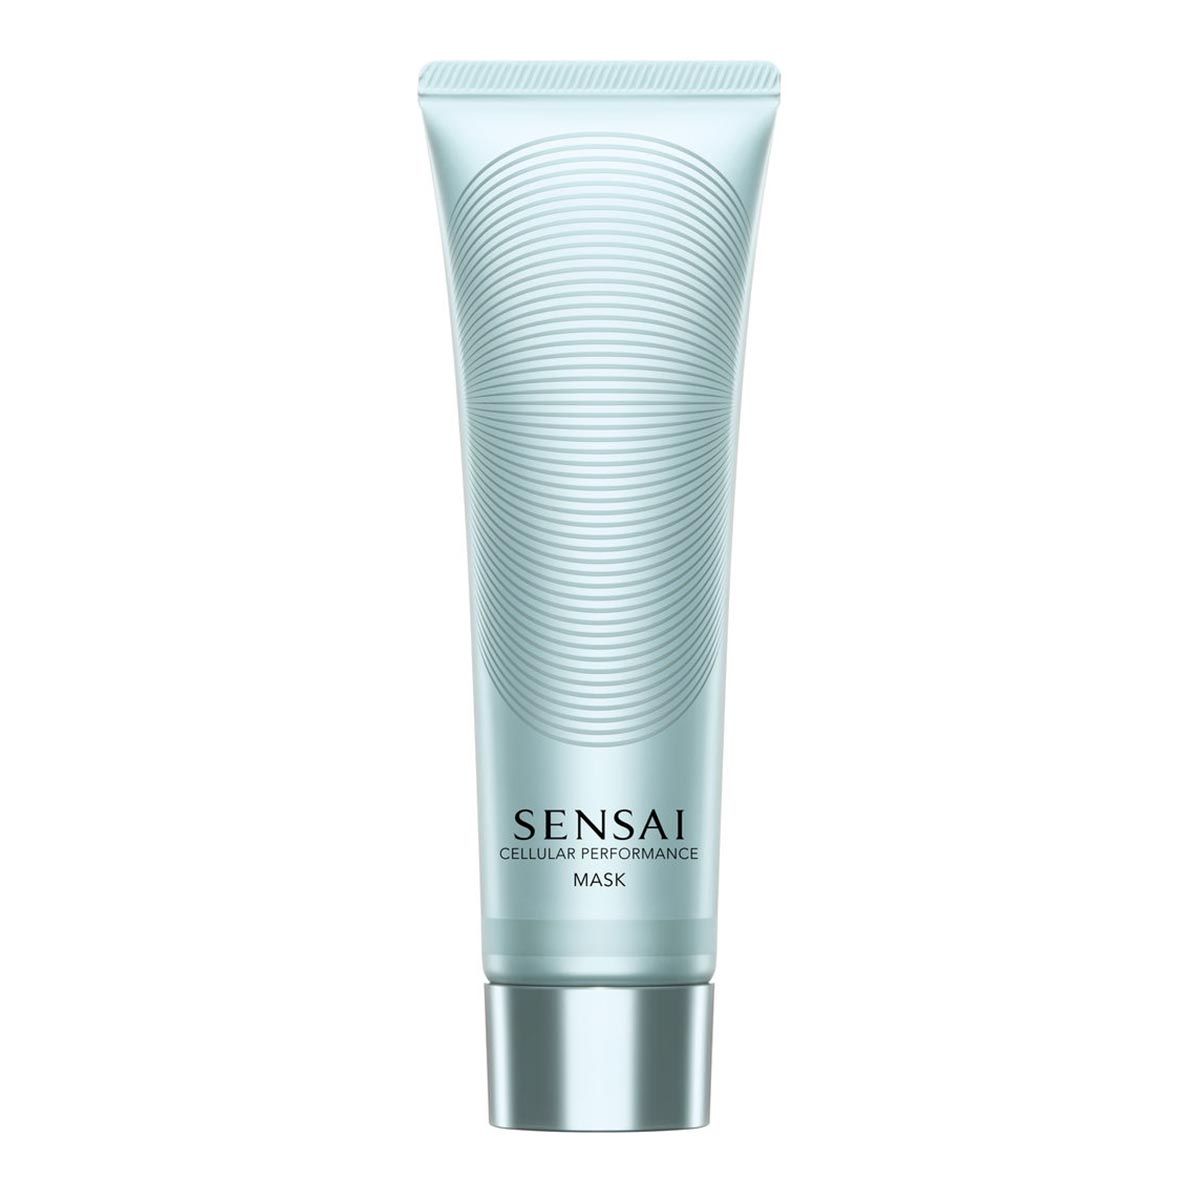 Kanebo sensai cellular mask 100ml